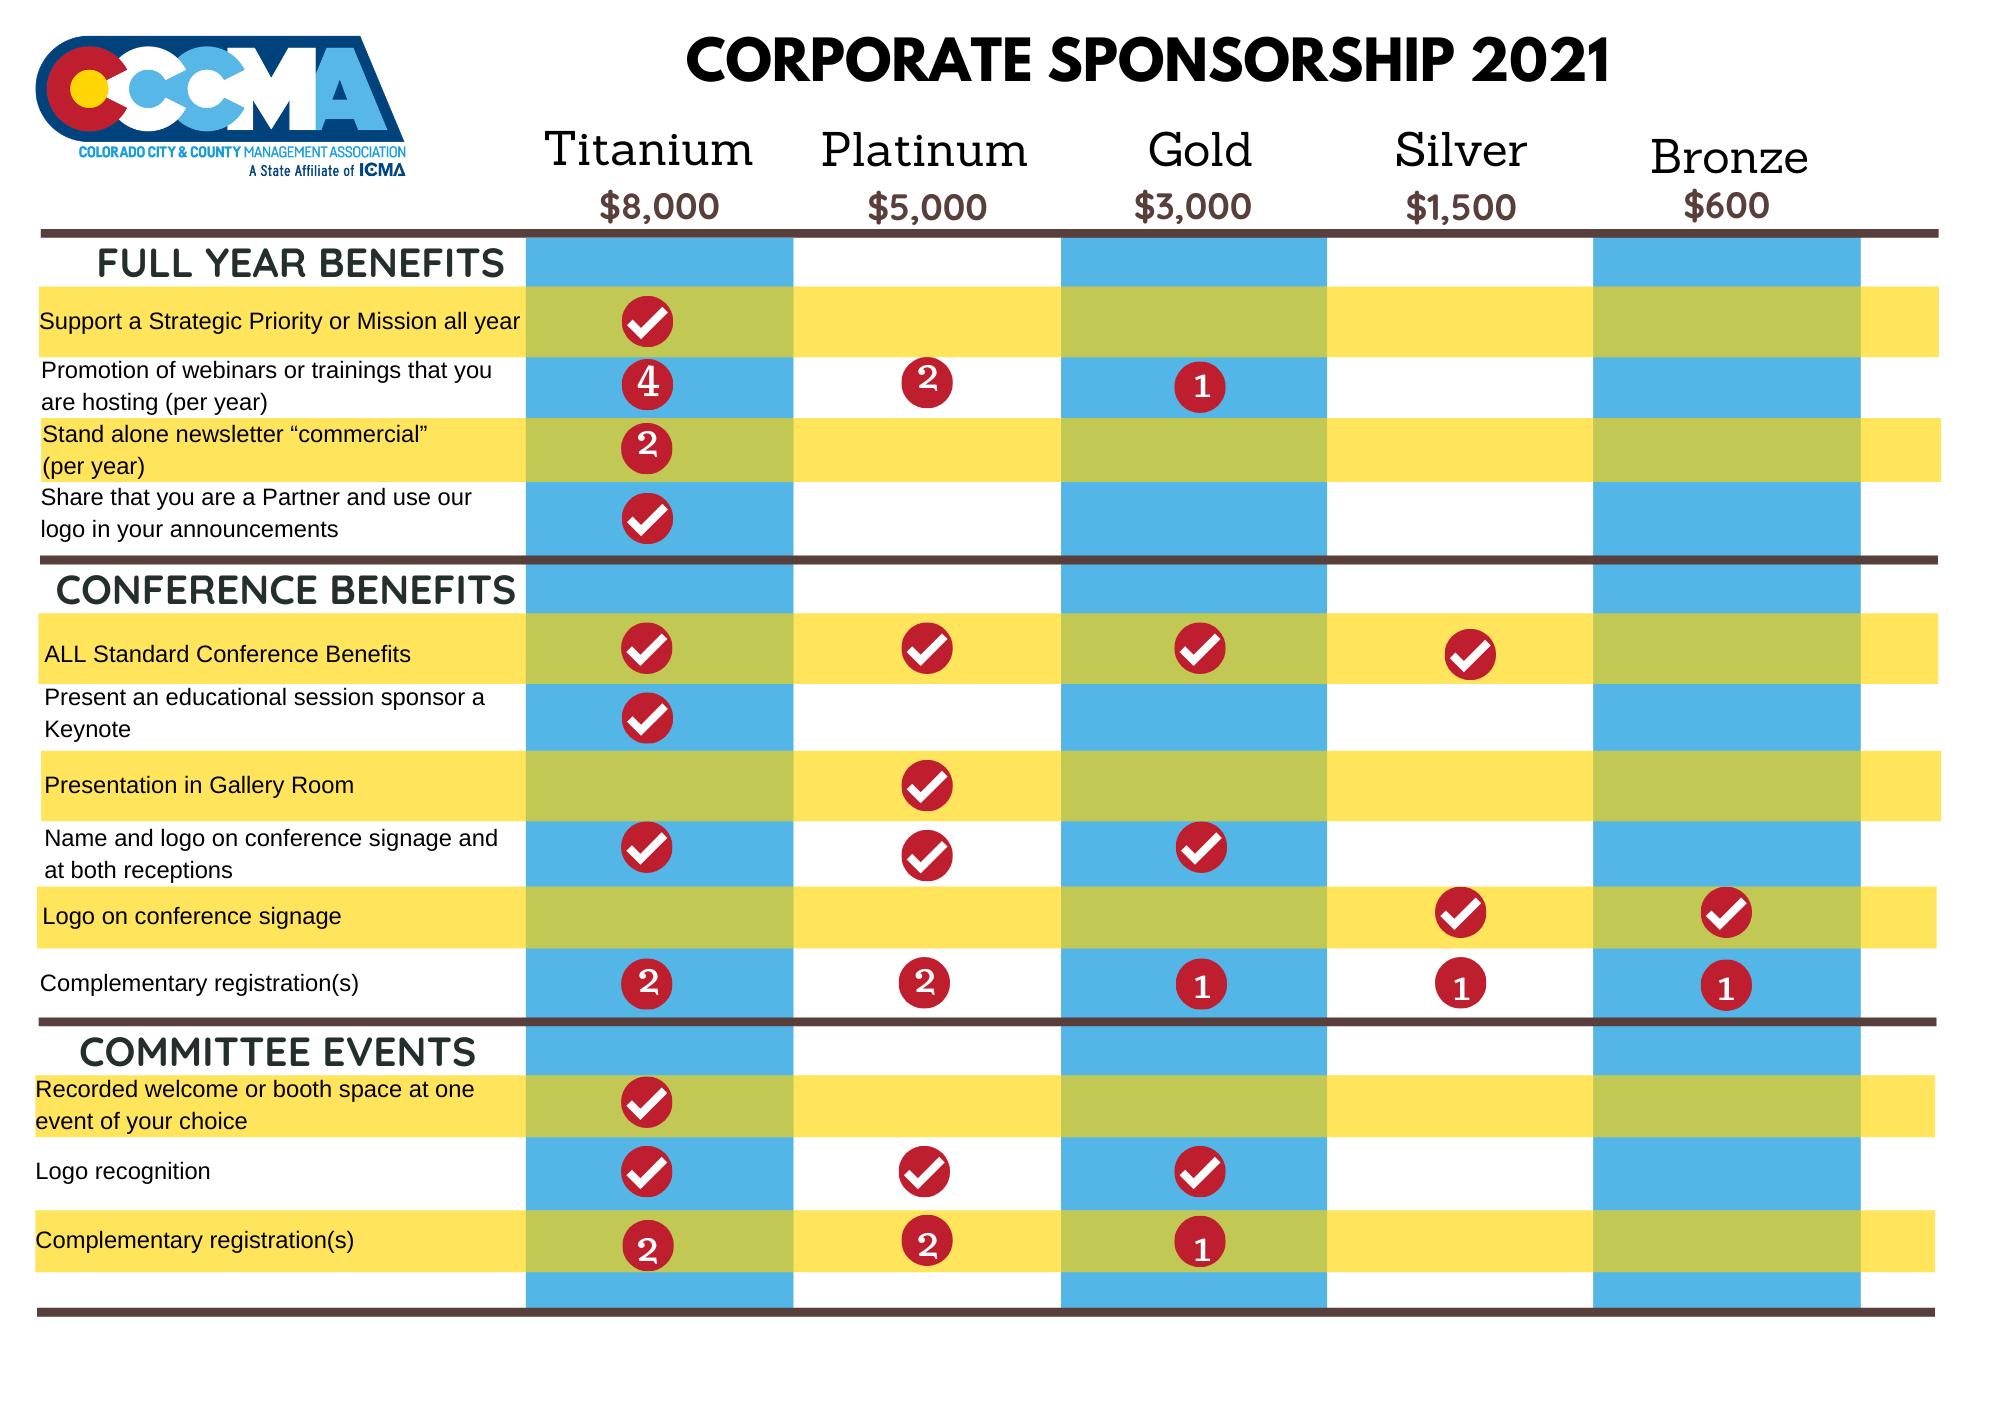 Corporate Sponsorship